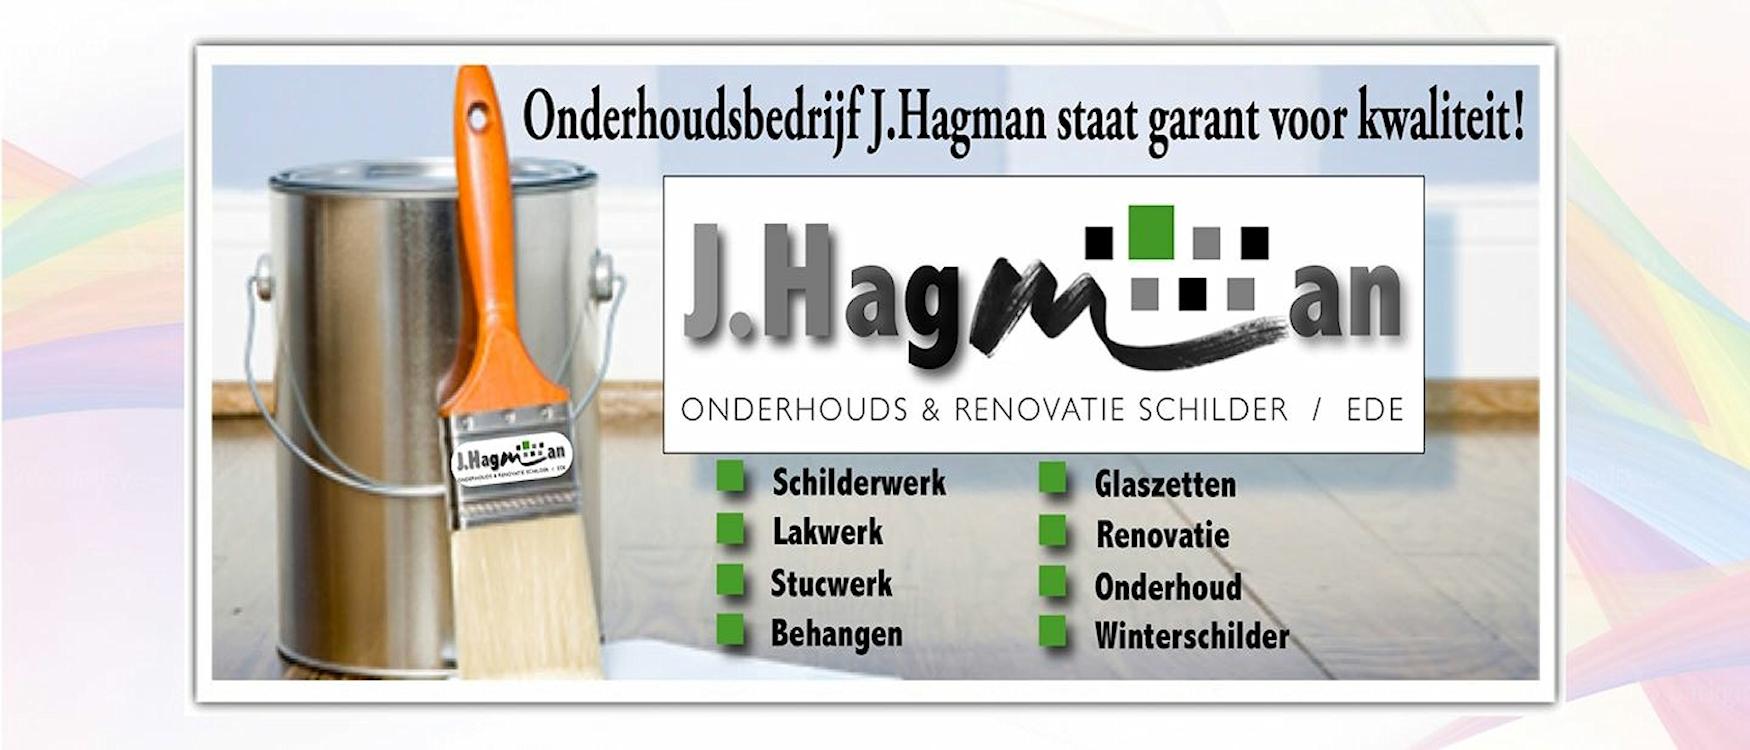 JHagman